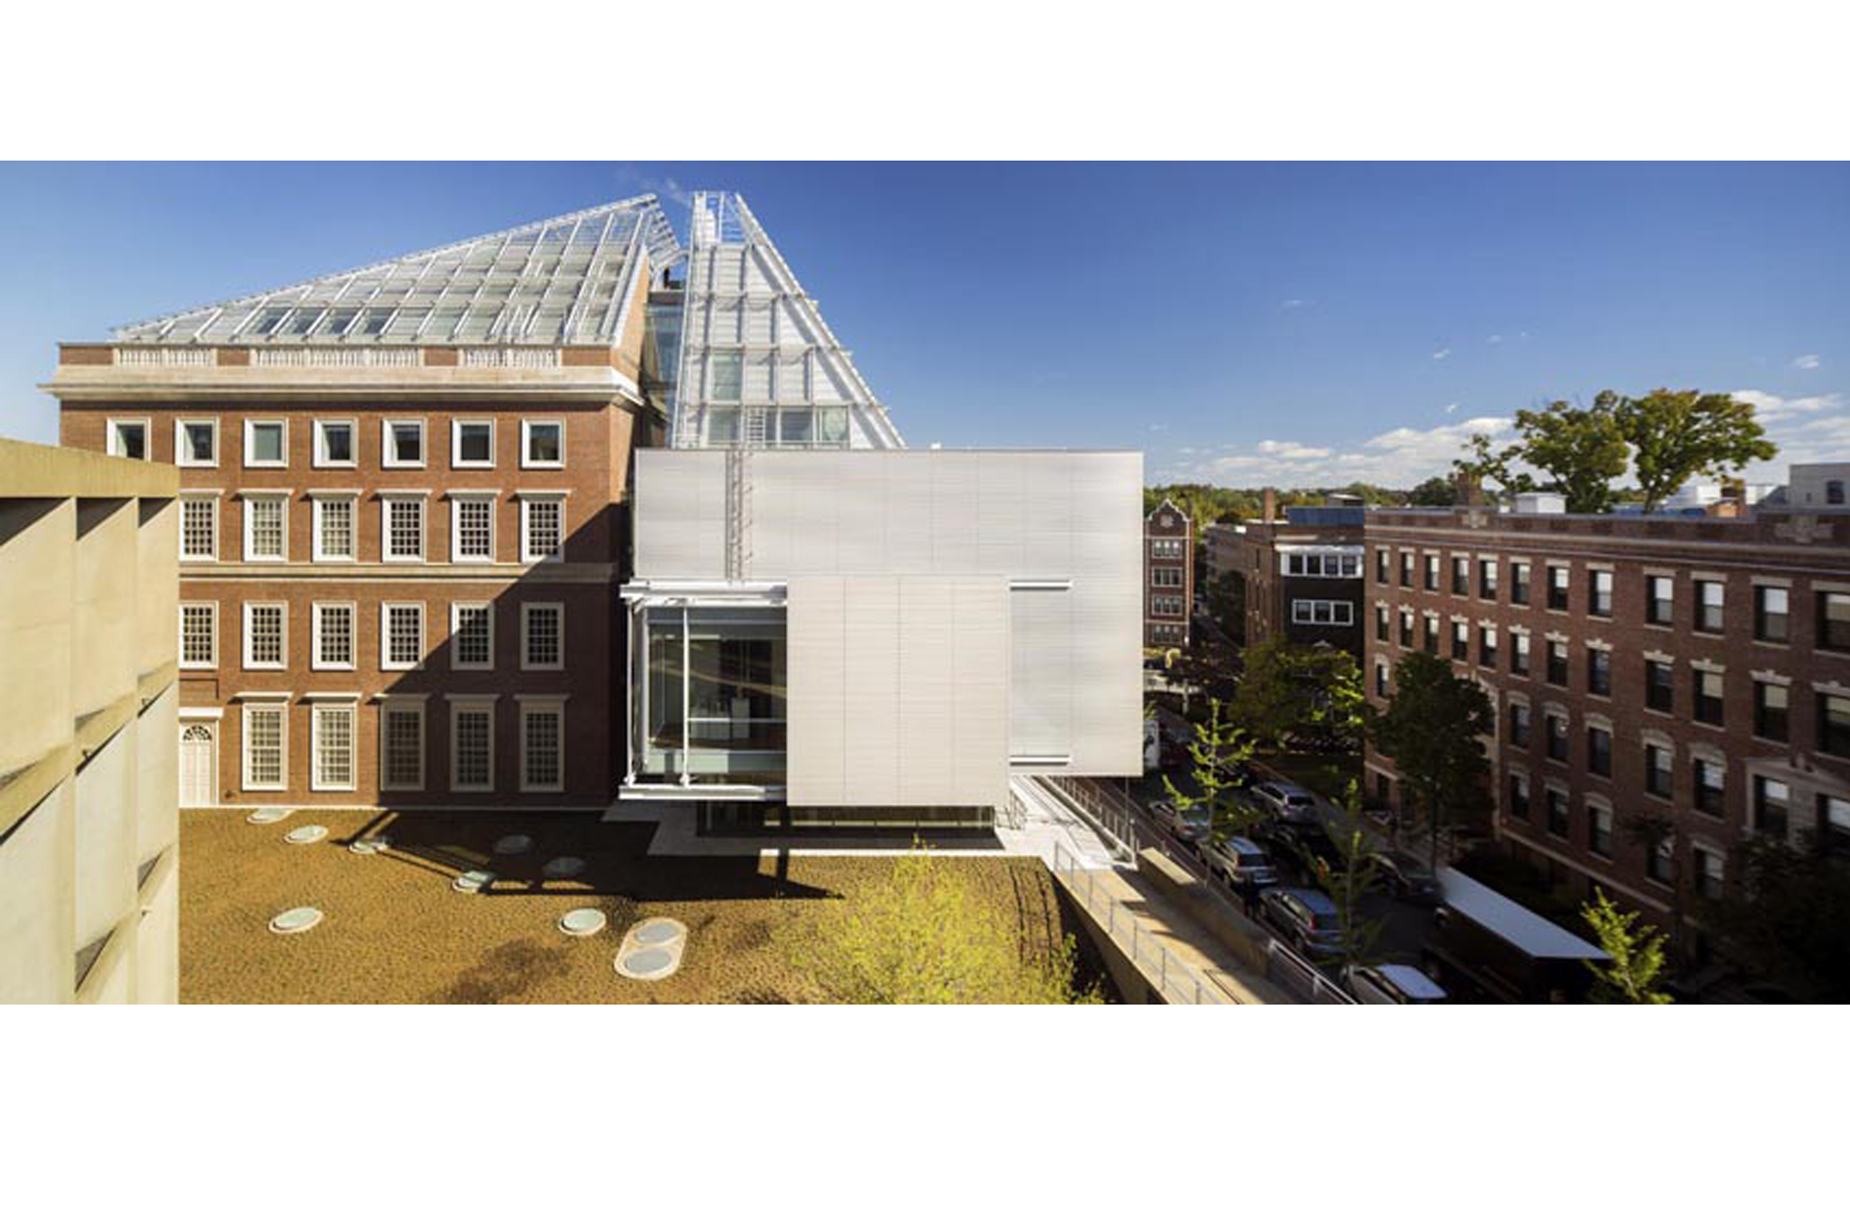 Thumbnail Harvard Art Museums Renovation and Expansion / 0